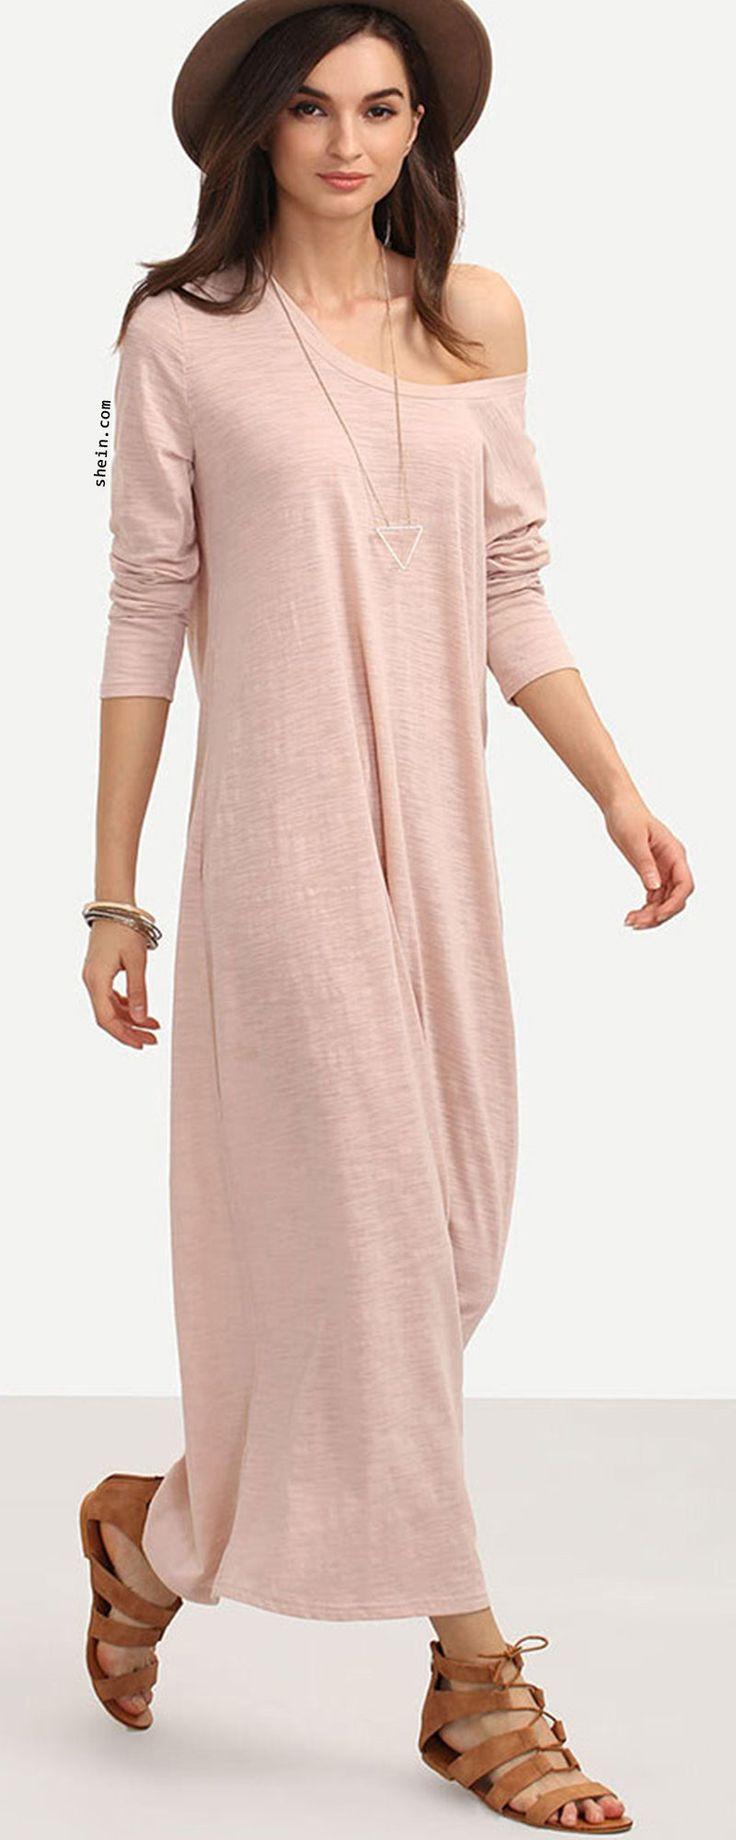 Loose Full Length Dress